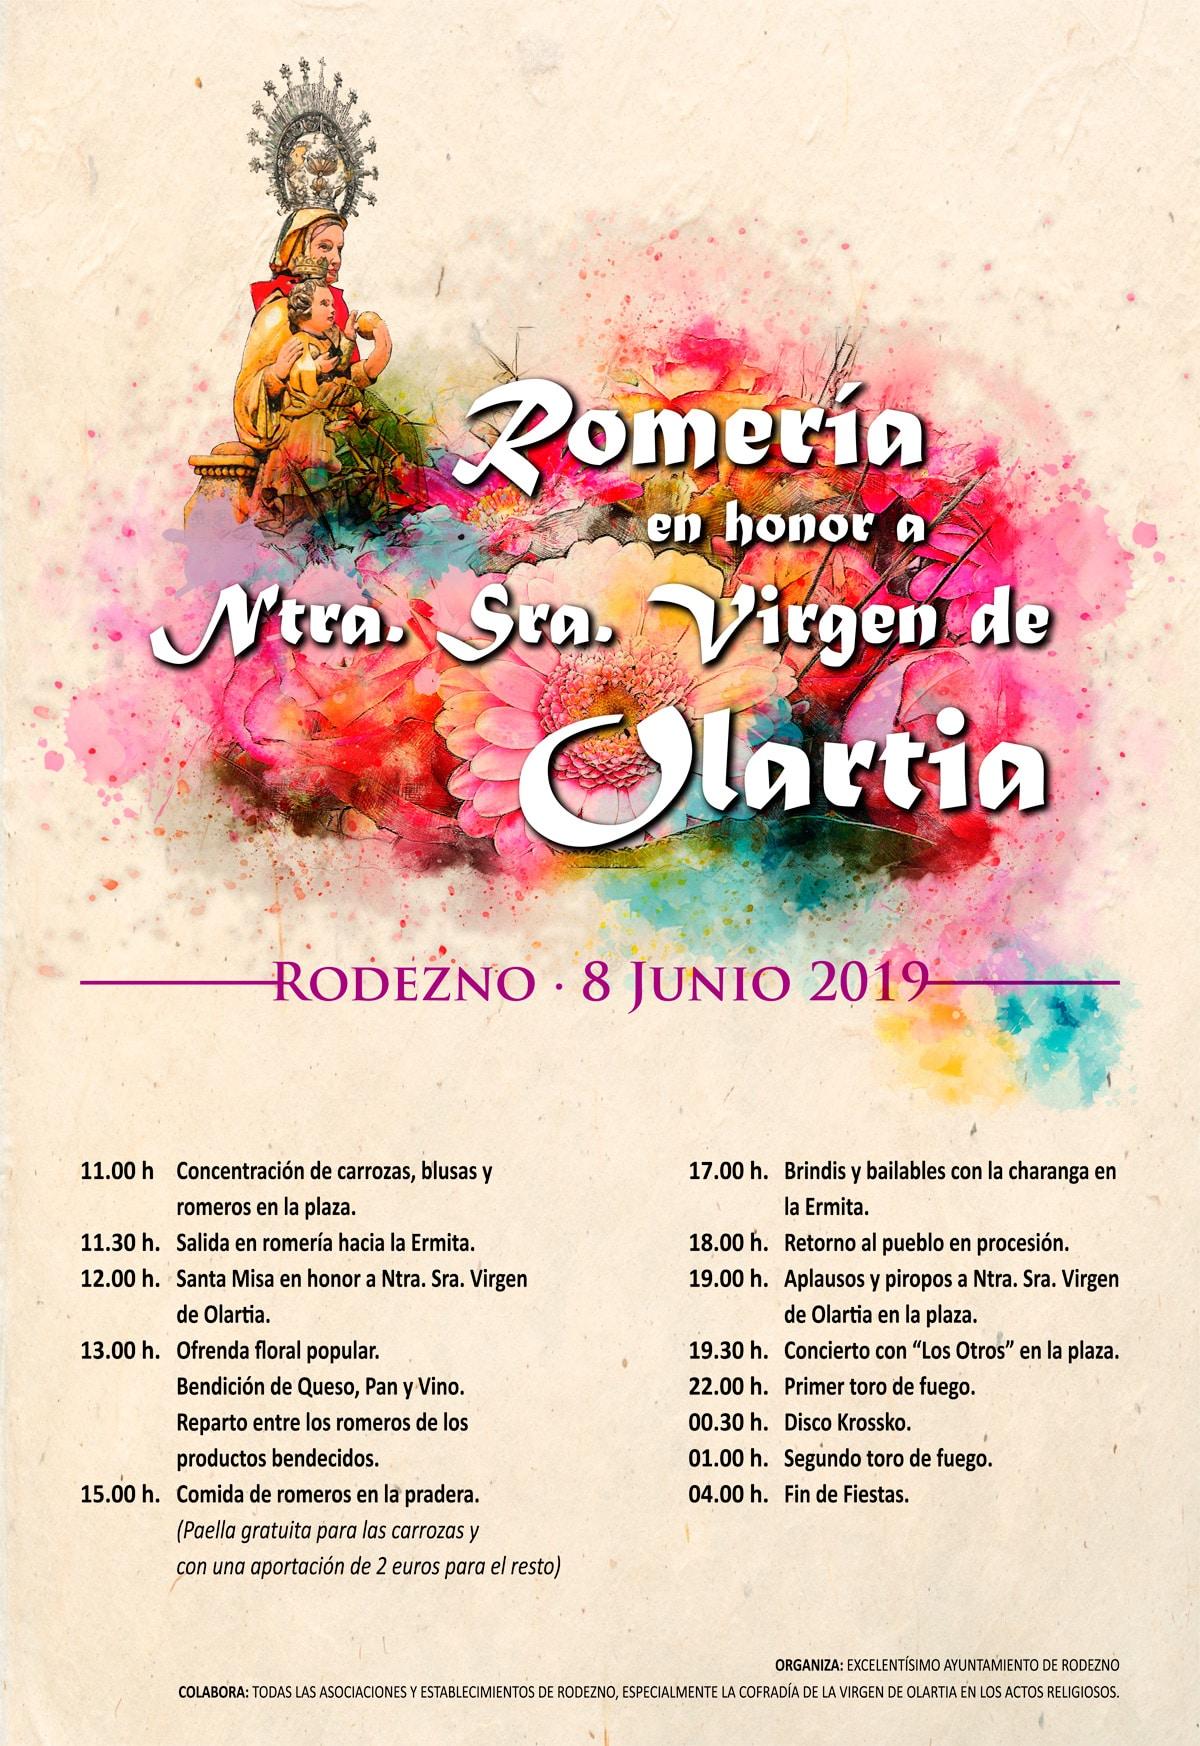 Rodezno celebra este sábado su romería a la ermita de la Virgen de Olartia 8